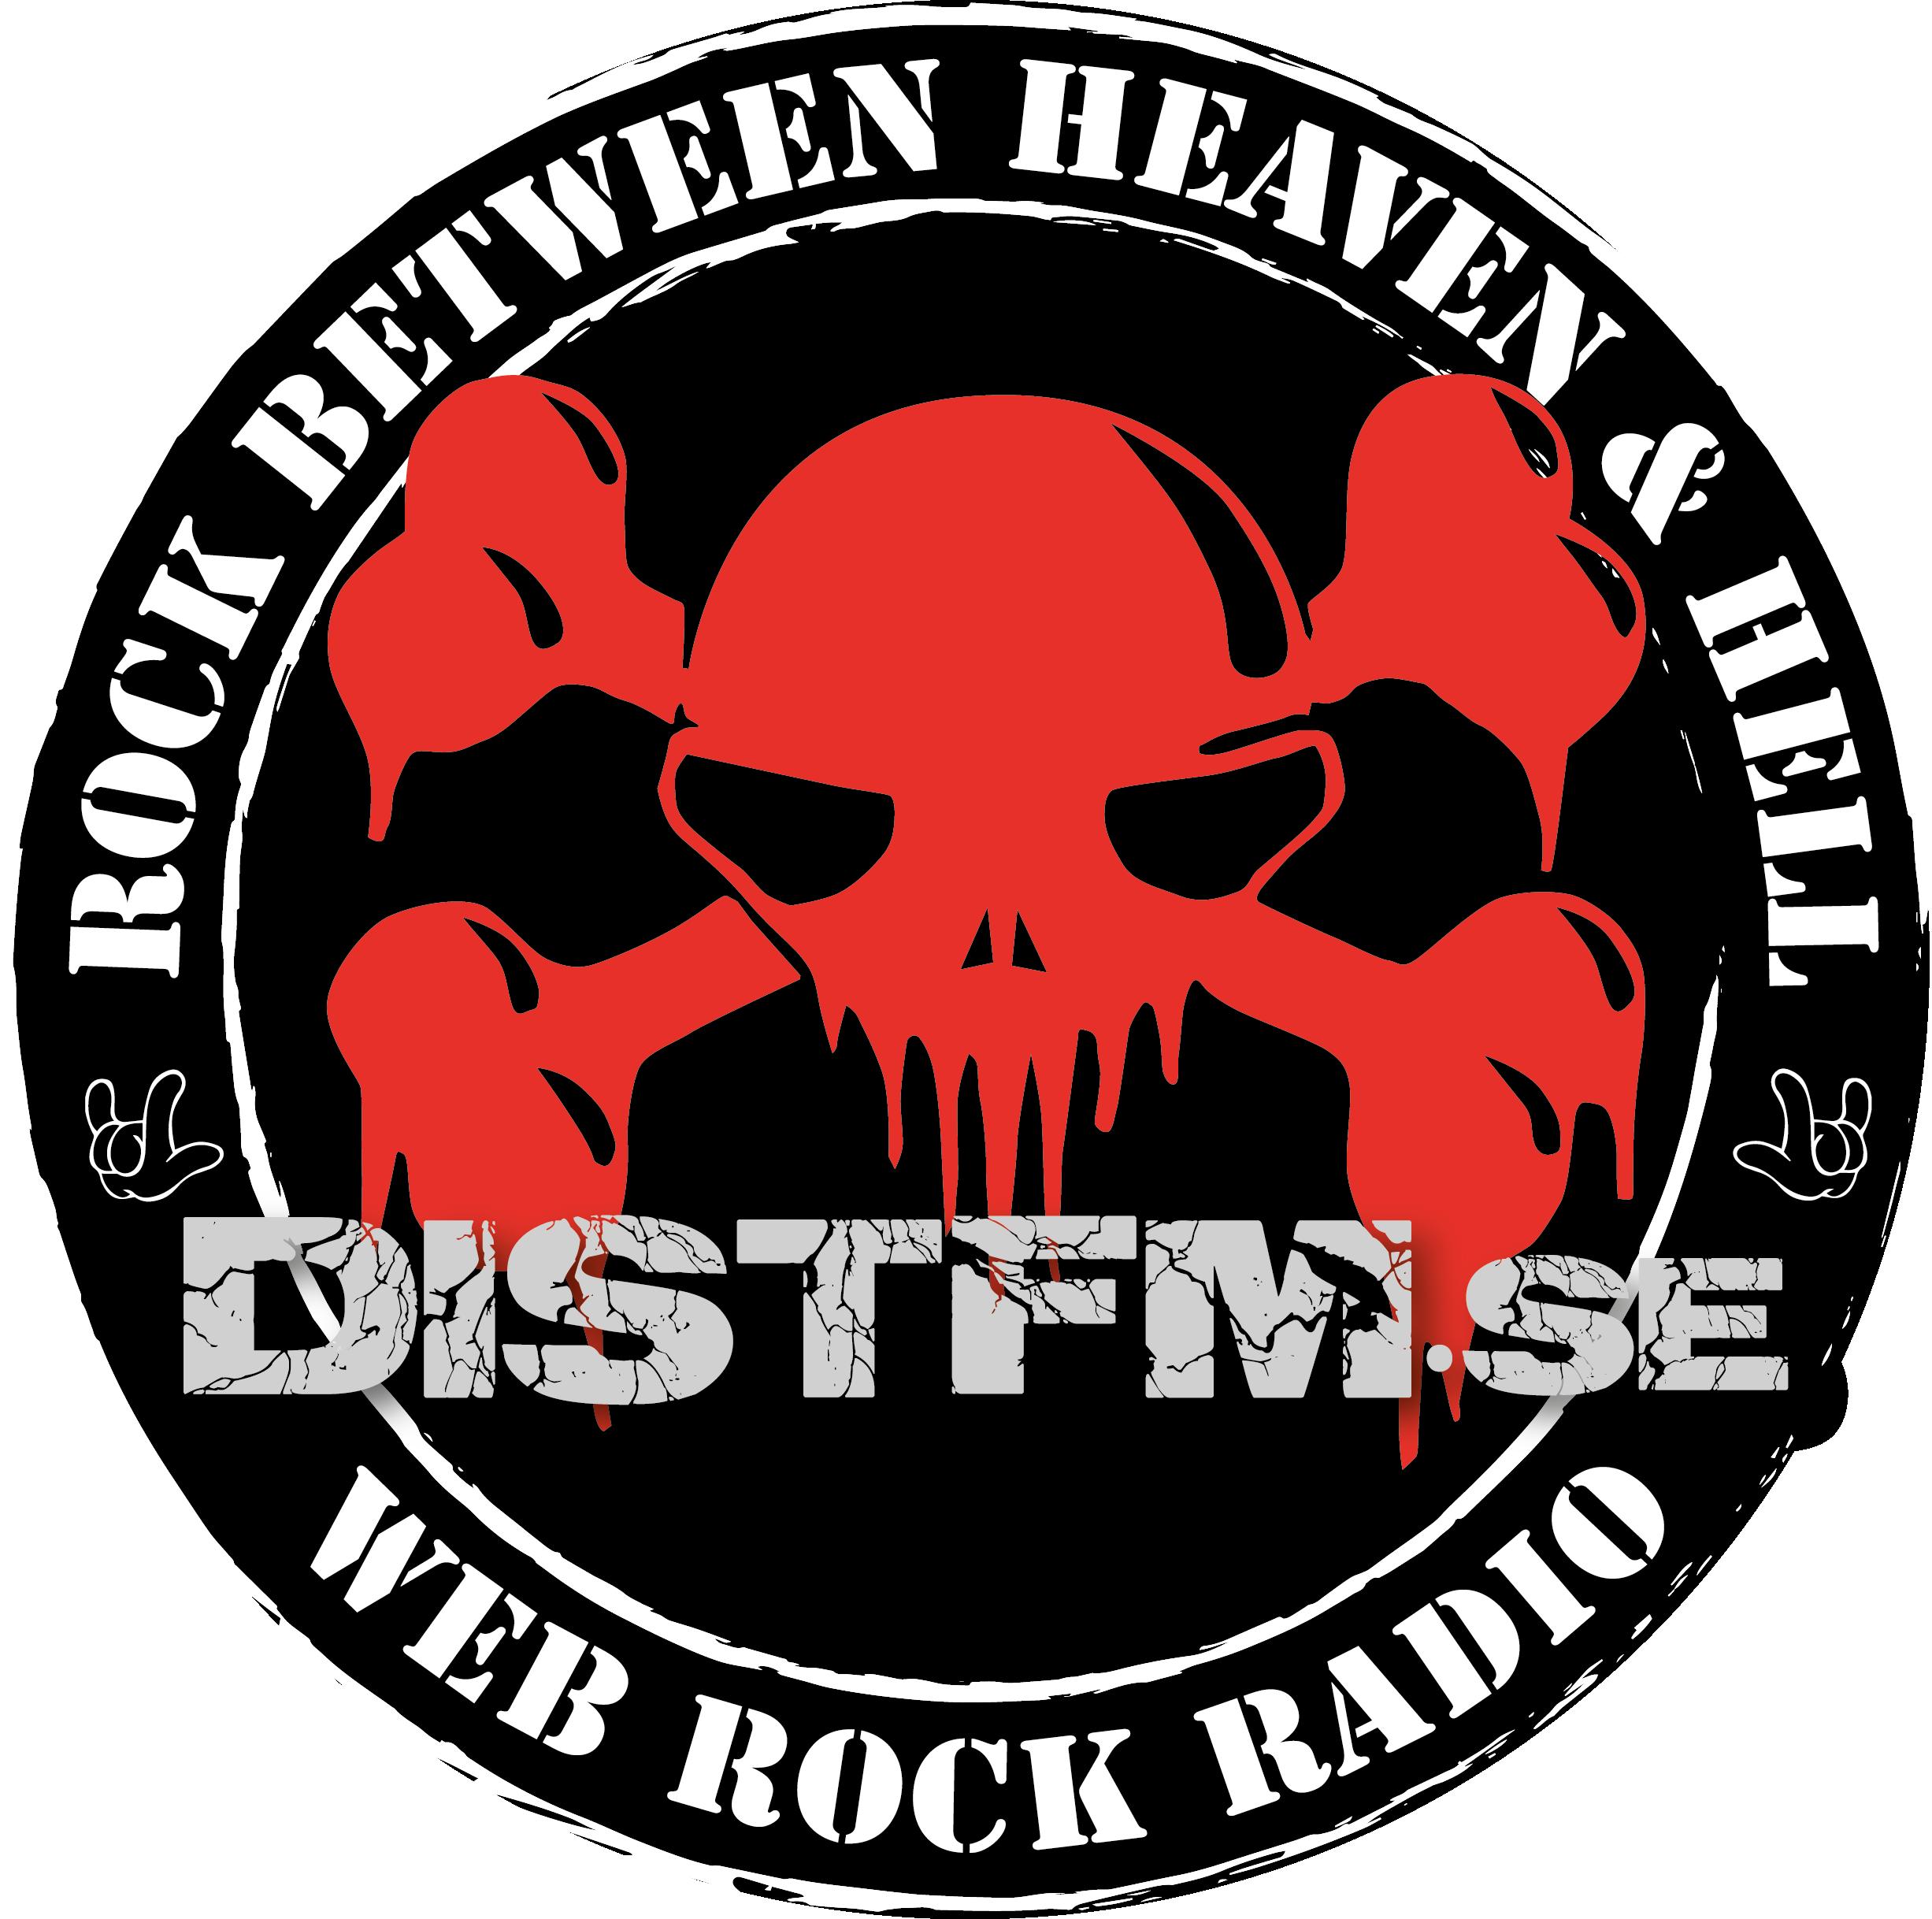 DistFM – 100% ROCK!